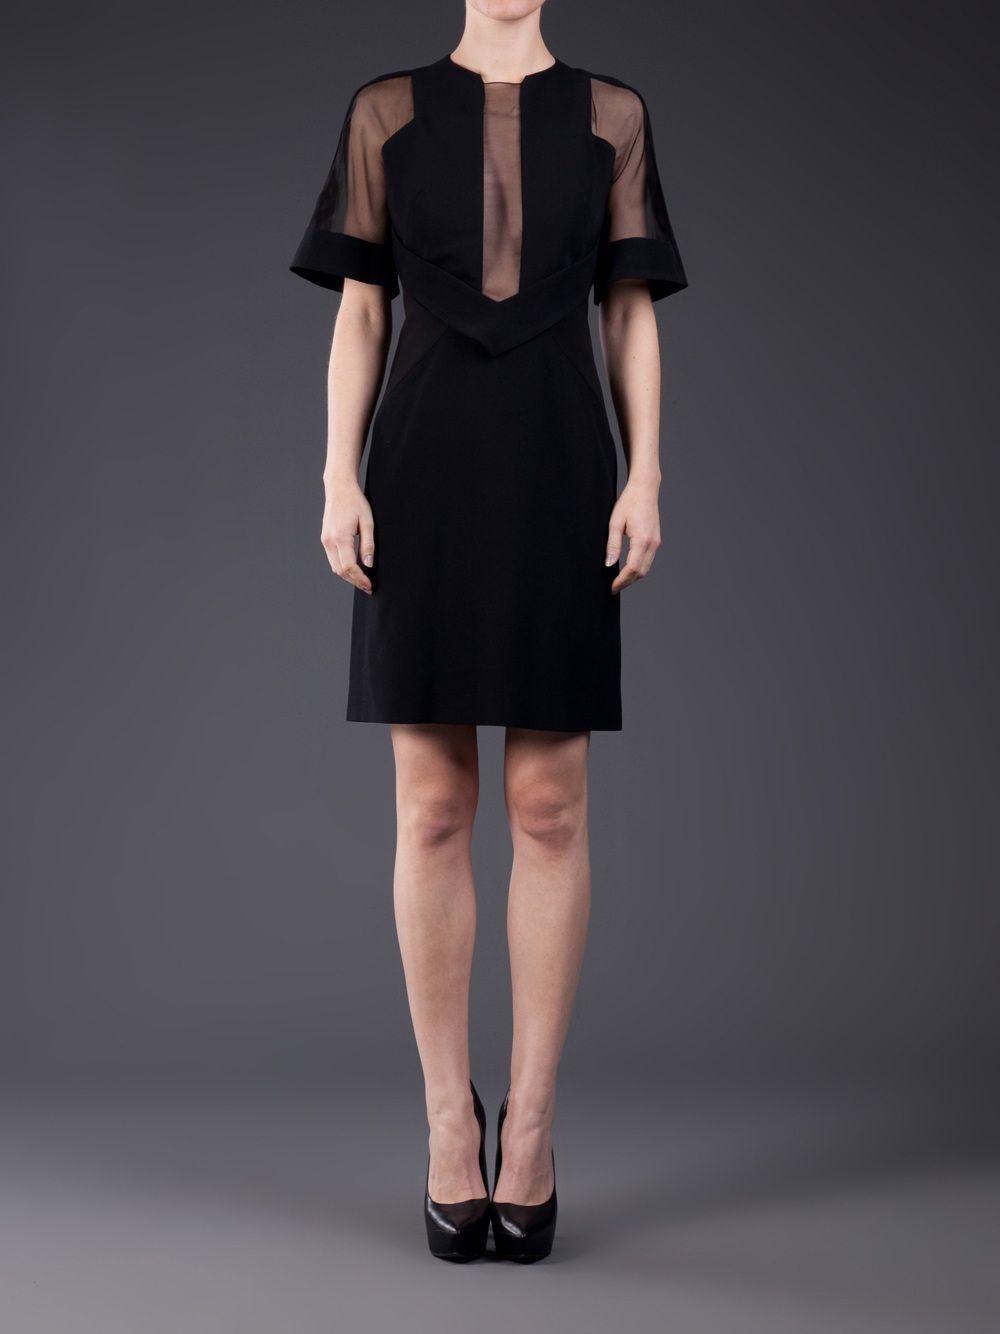 David Koma Sheer Sleeve Dress - H. Lorenzo - farfetch.com